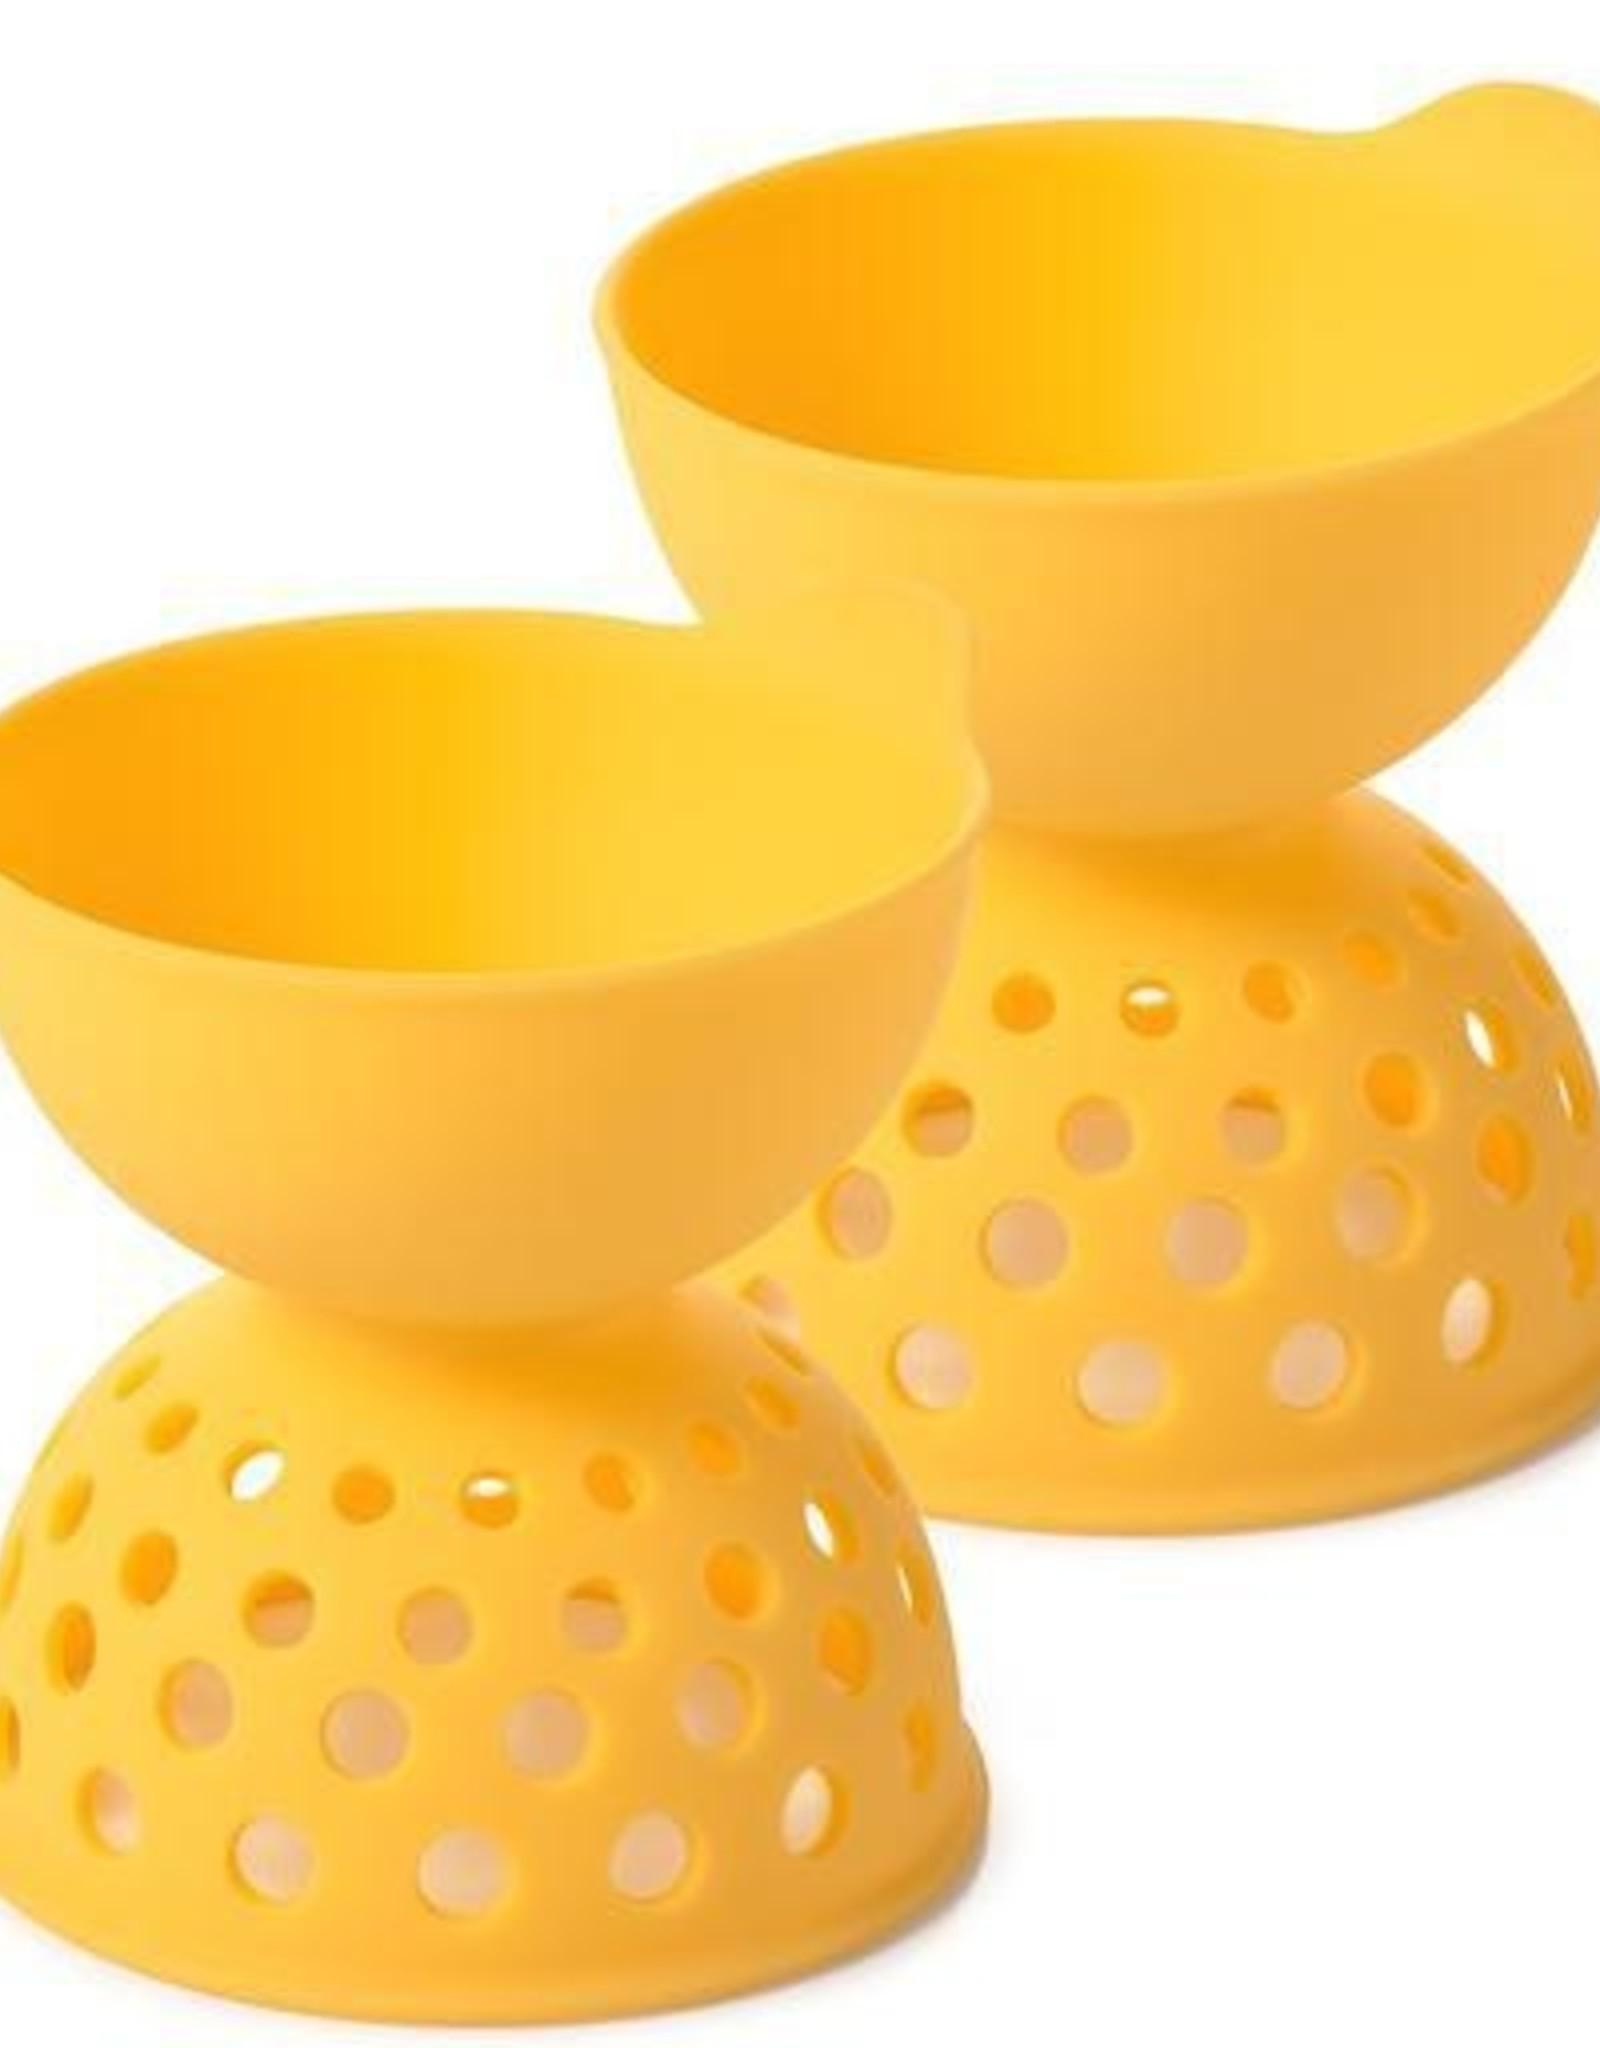 OXO SIlicone Egg Poacher 2 Pack, Yellow